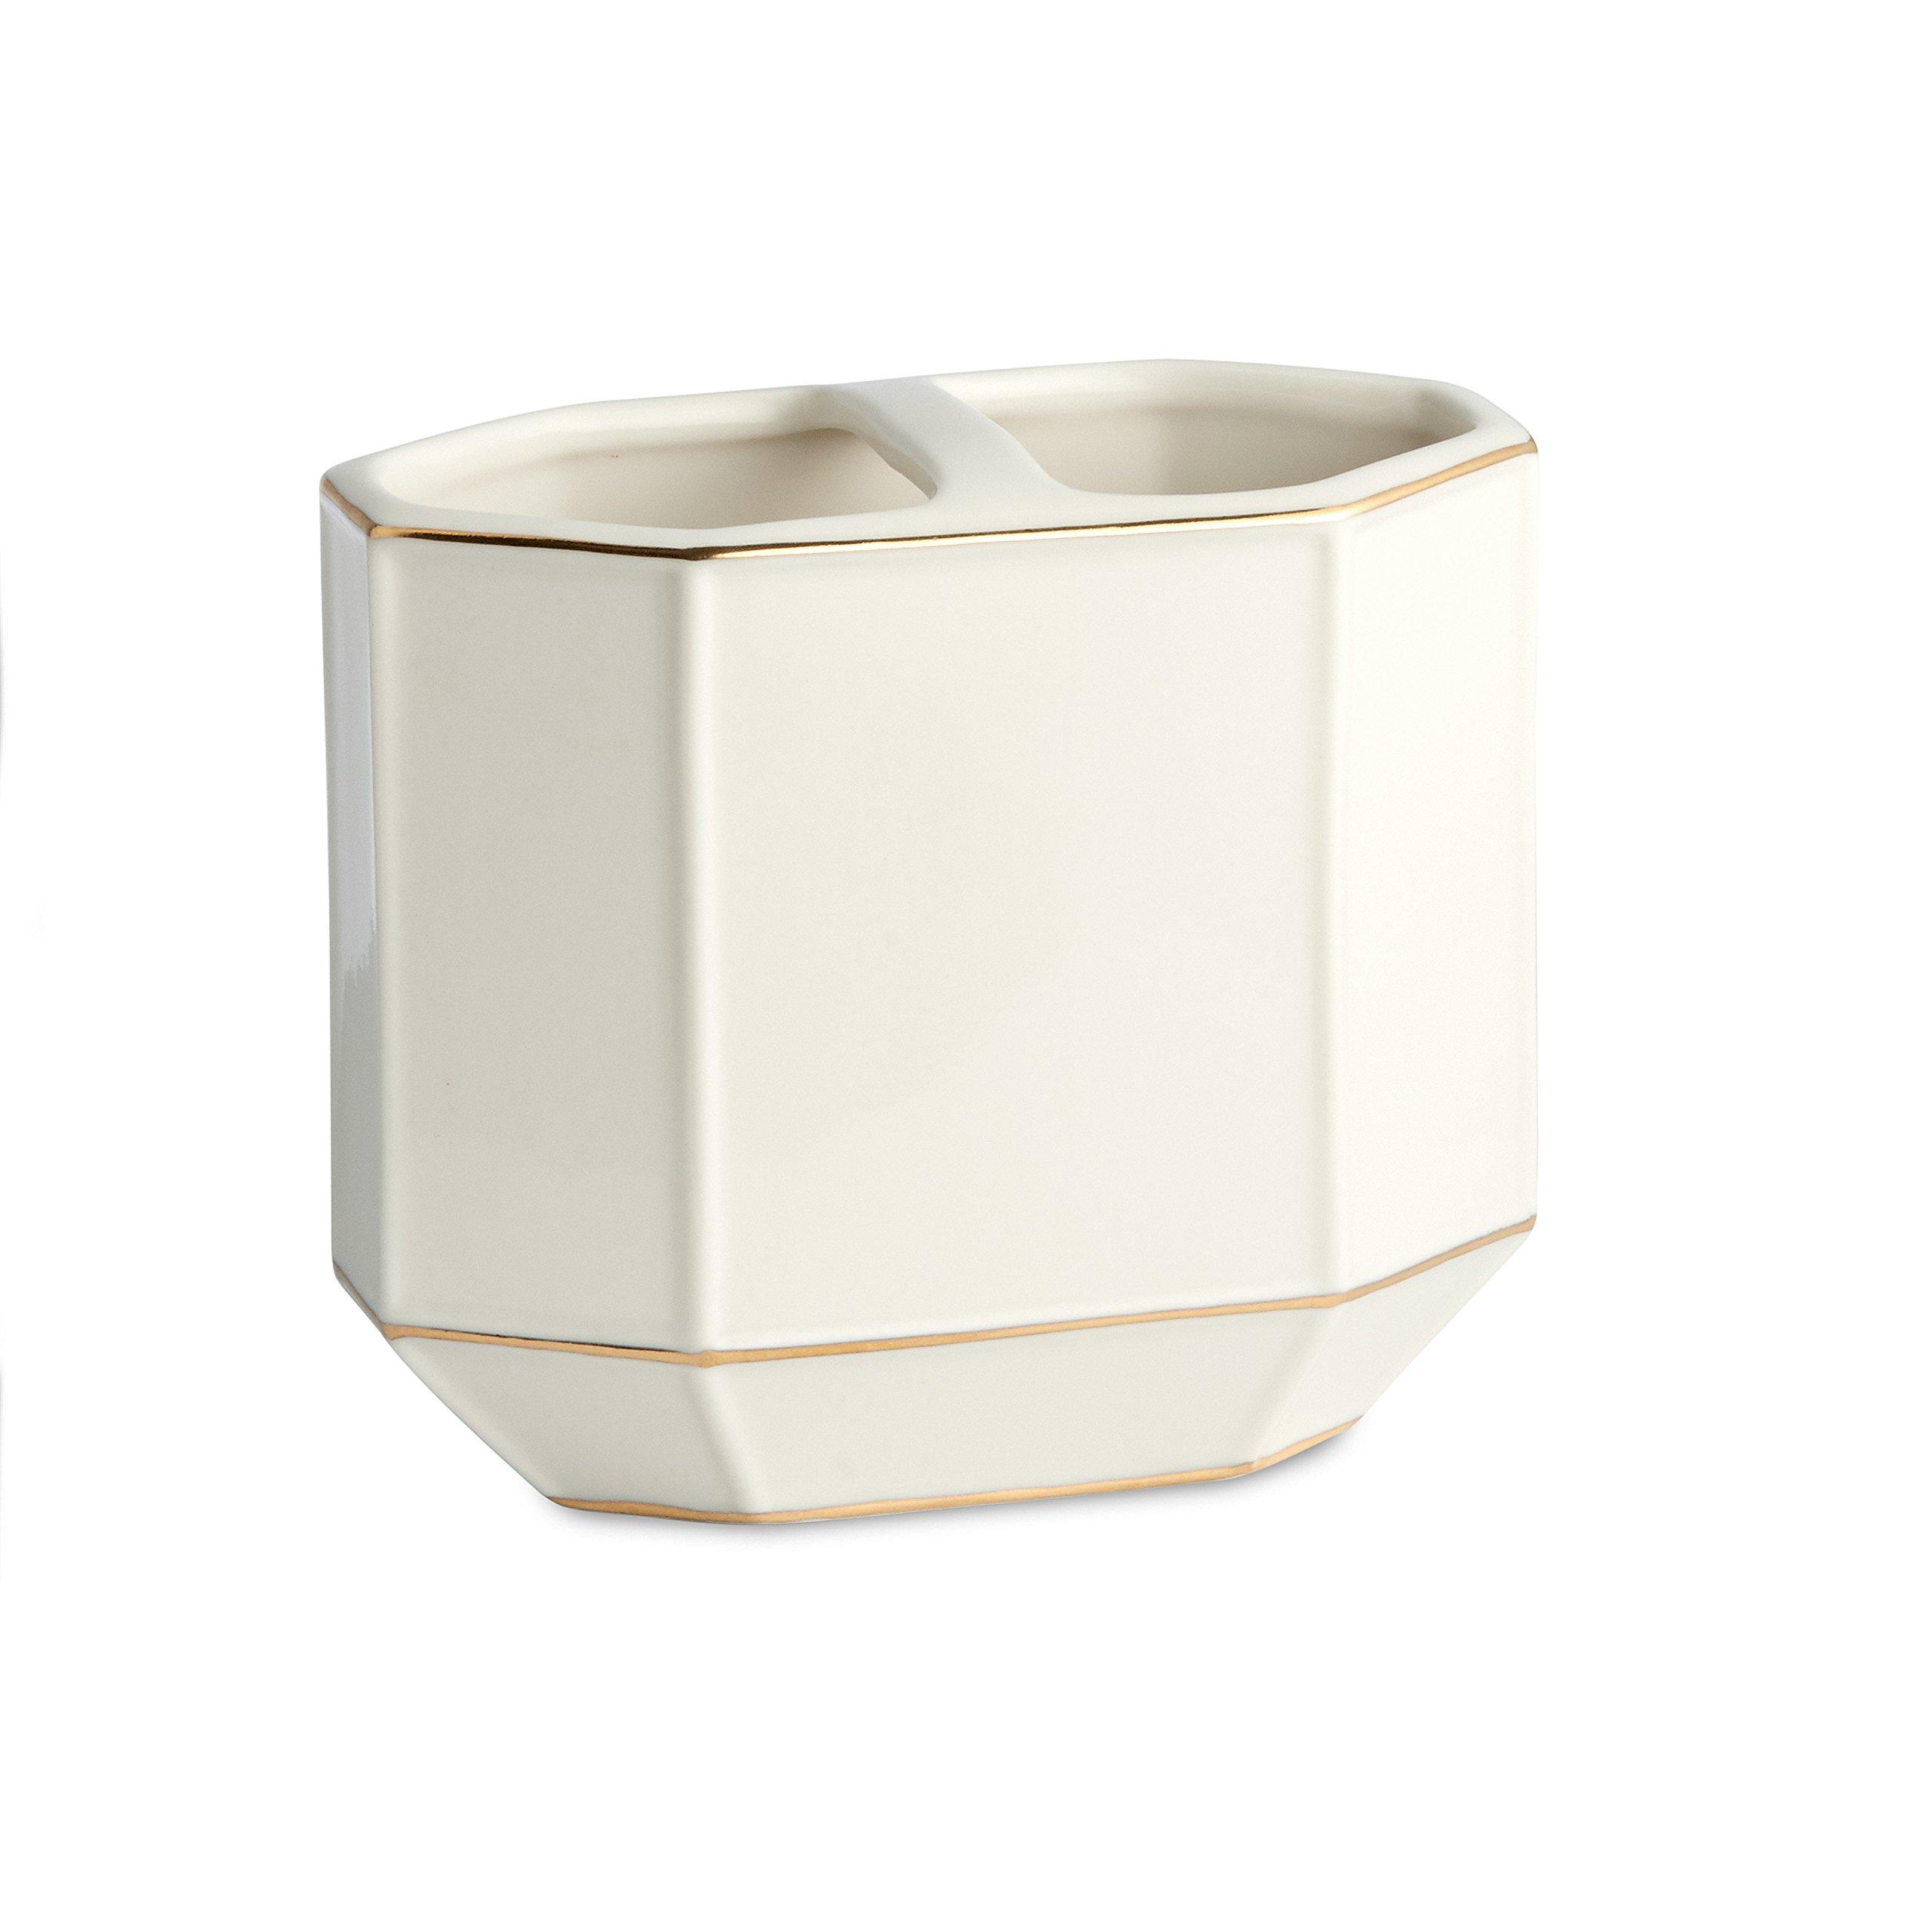 Toothbrush Holder, Kassatex St. Honore Bath Accessories | Porcelain